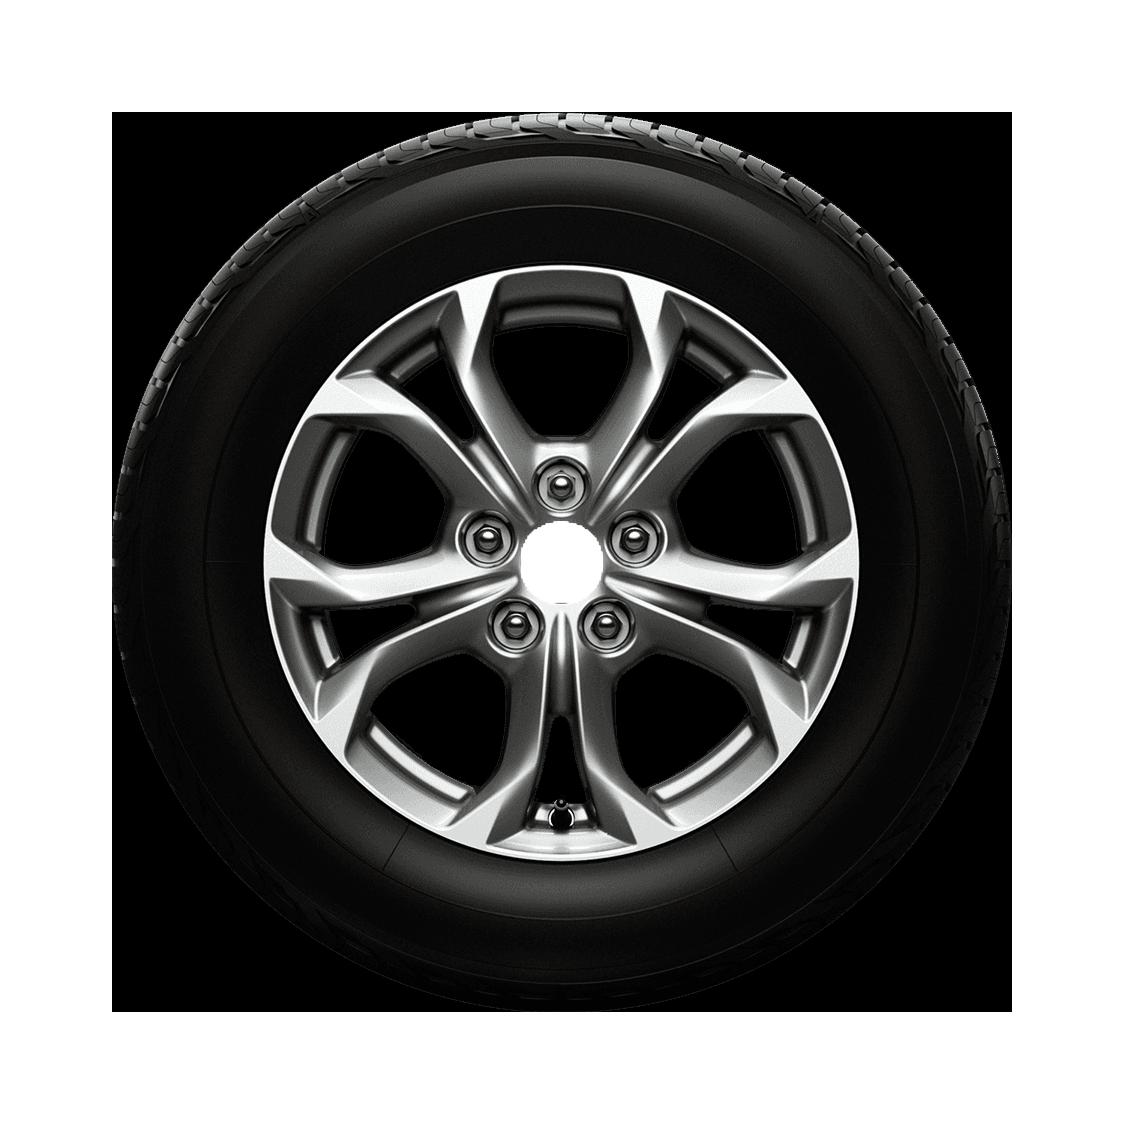 Pirelli W210 SnowControl Series 3